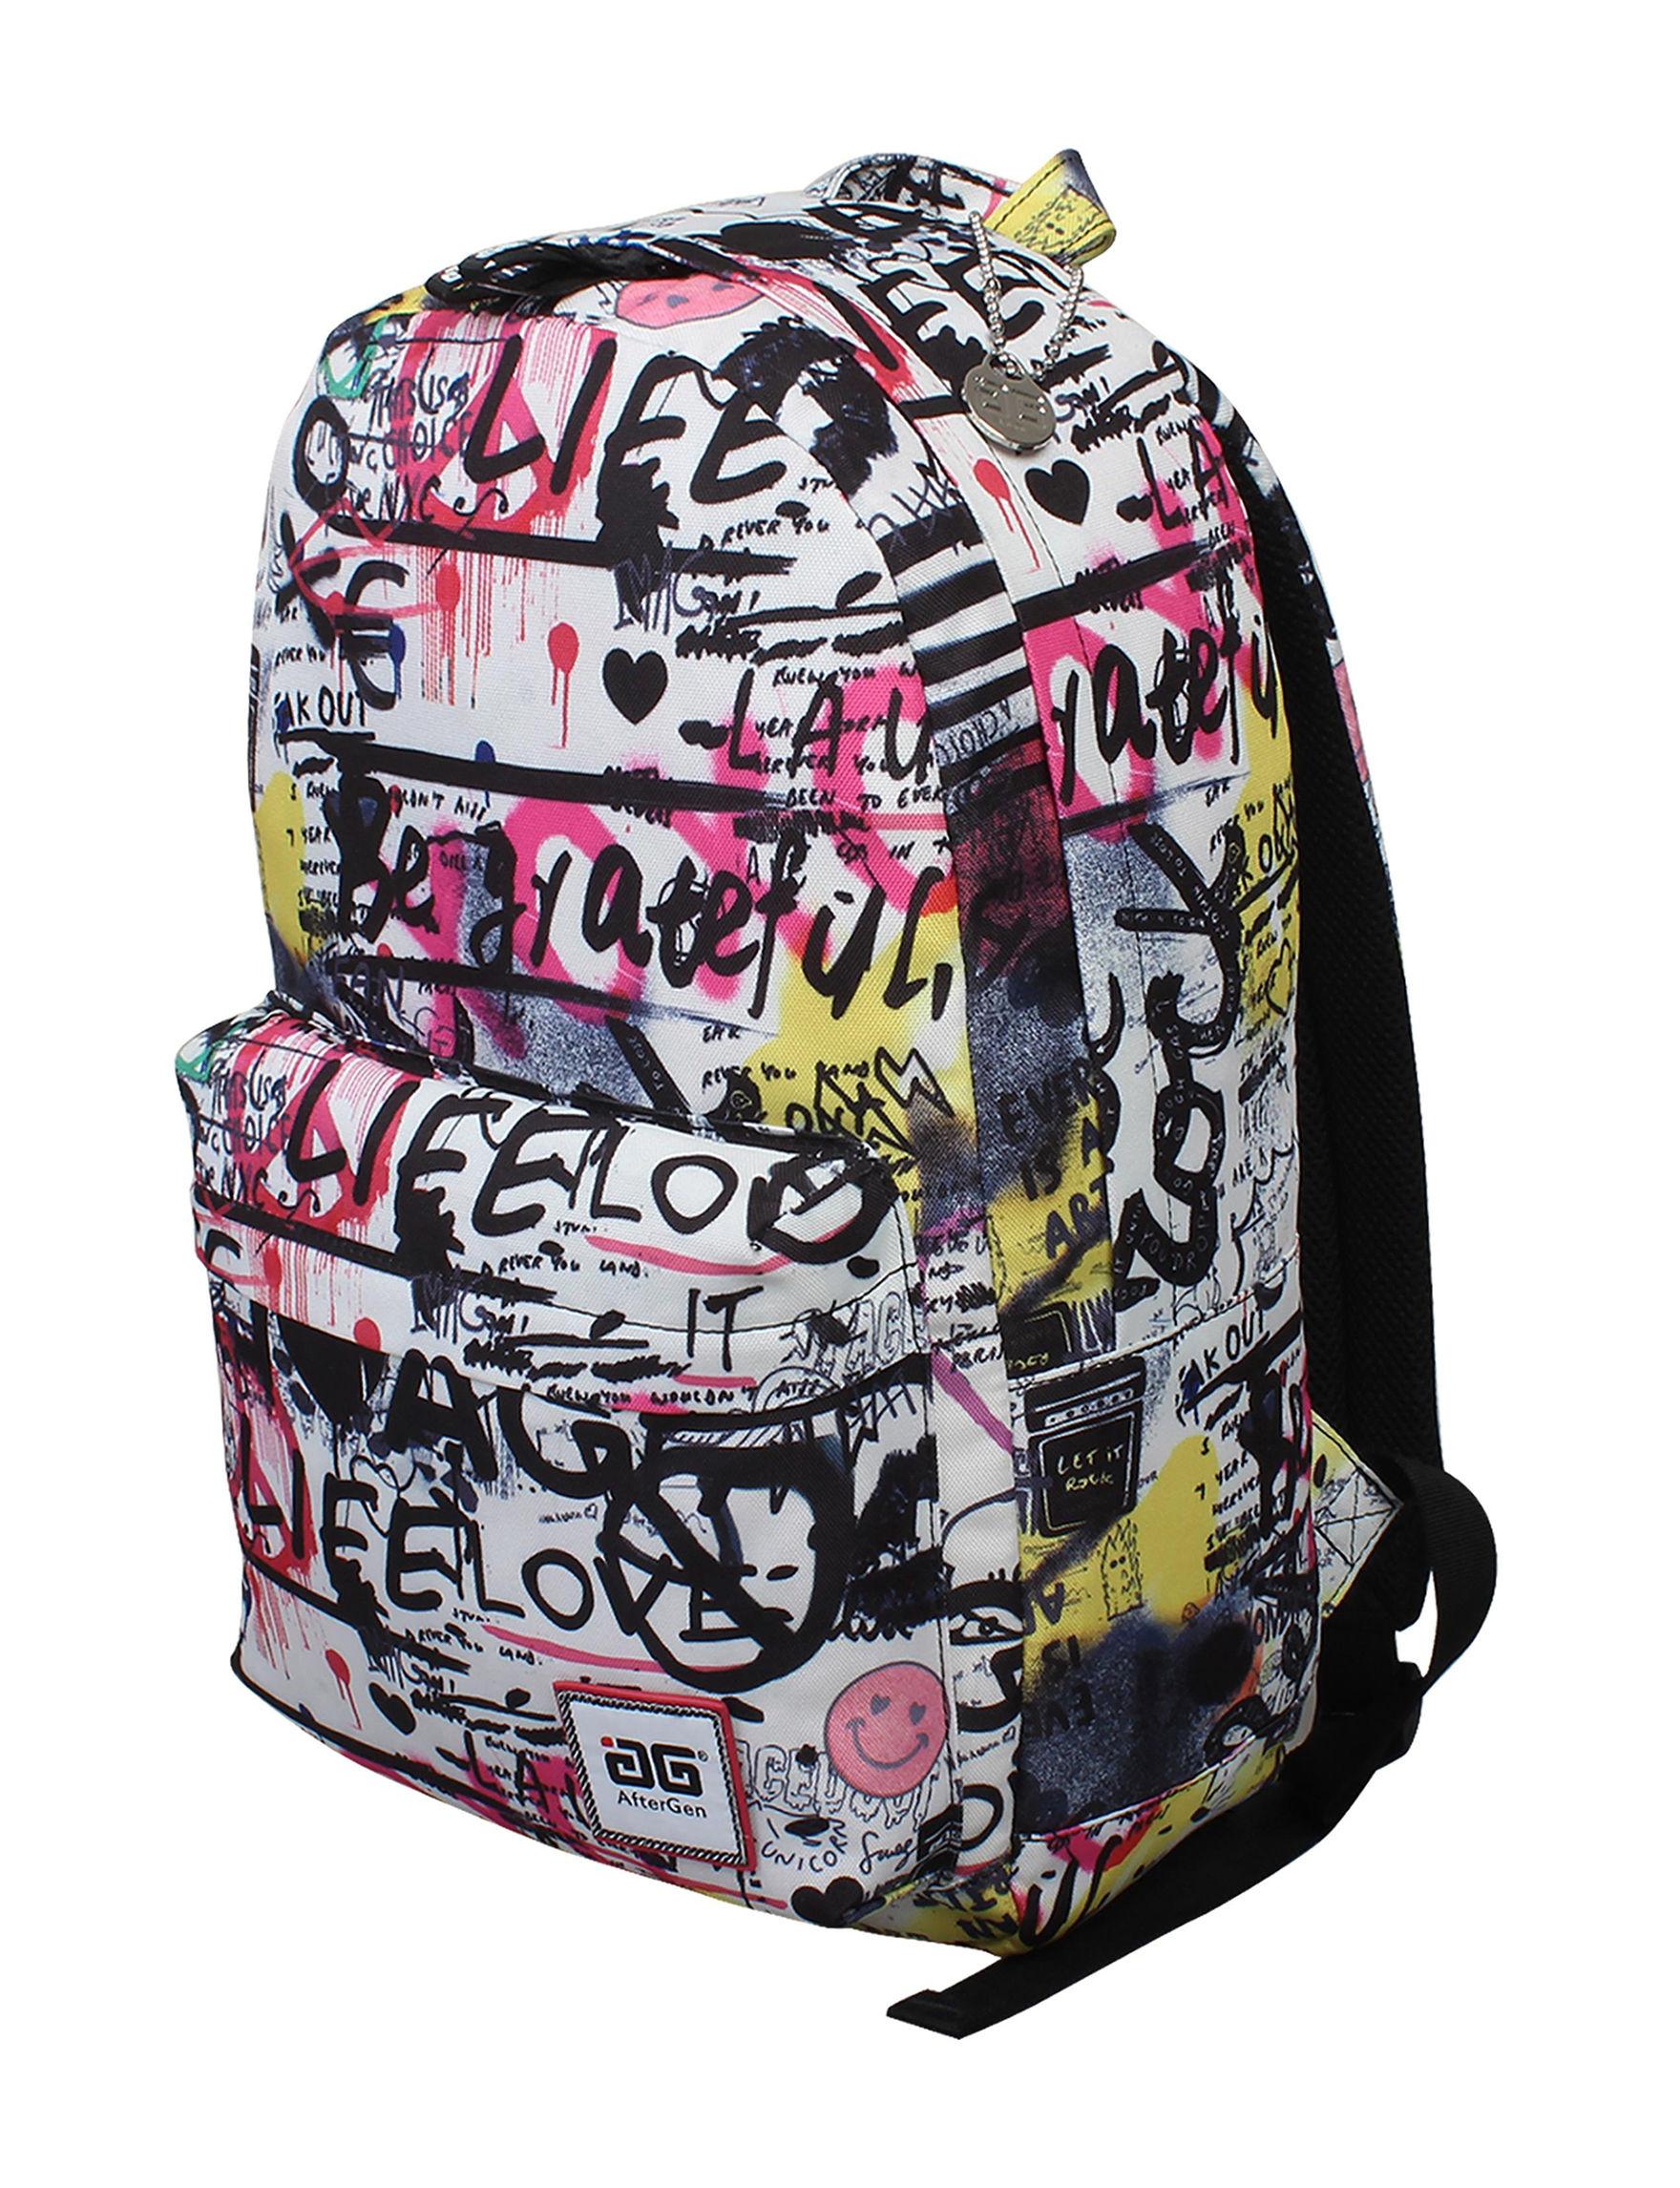 Aftergen Pink / White / Black Bookbags & Backpacks